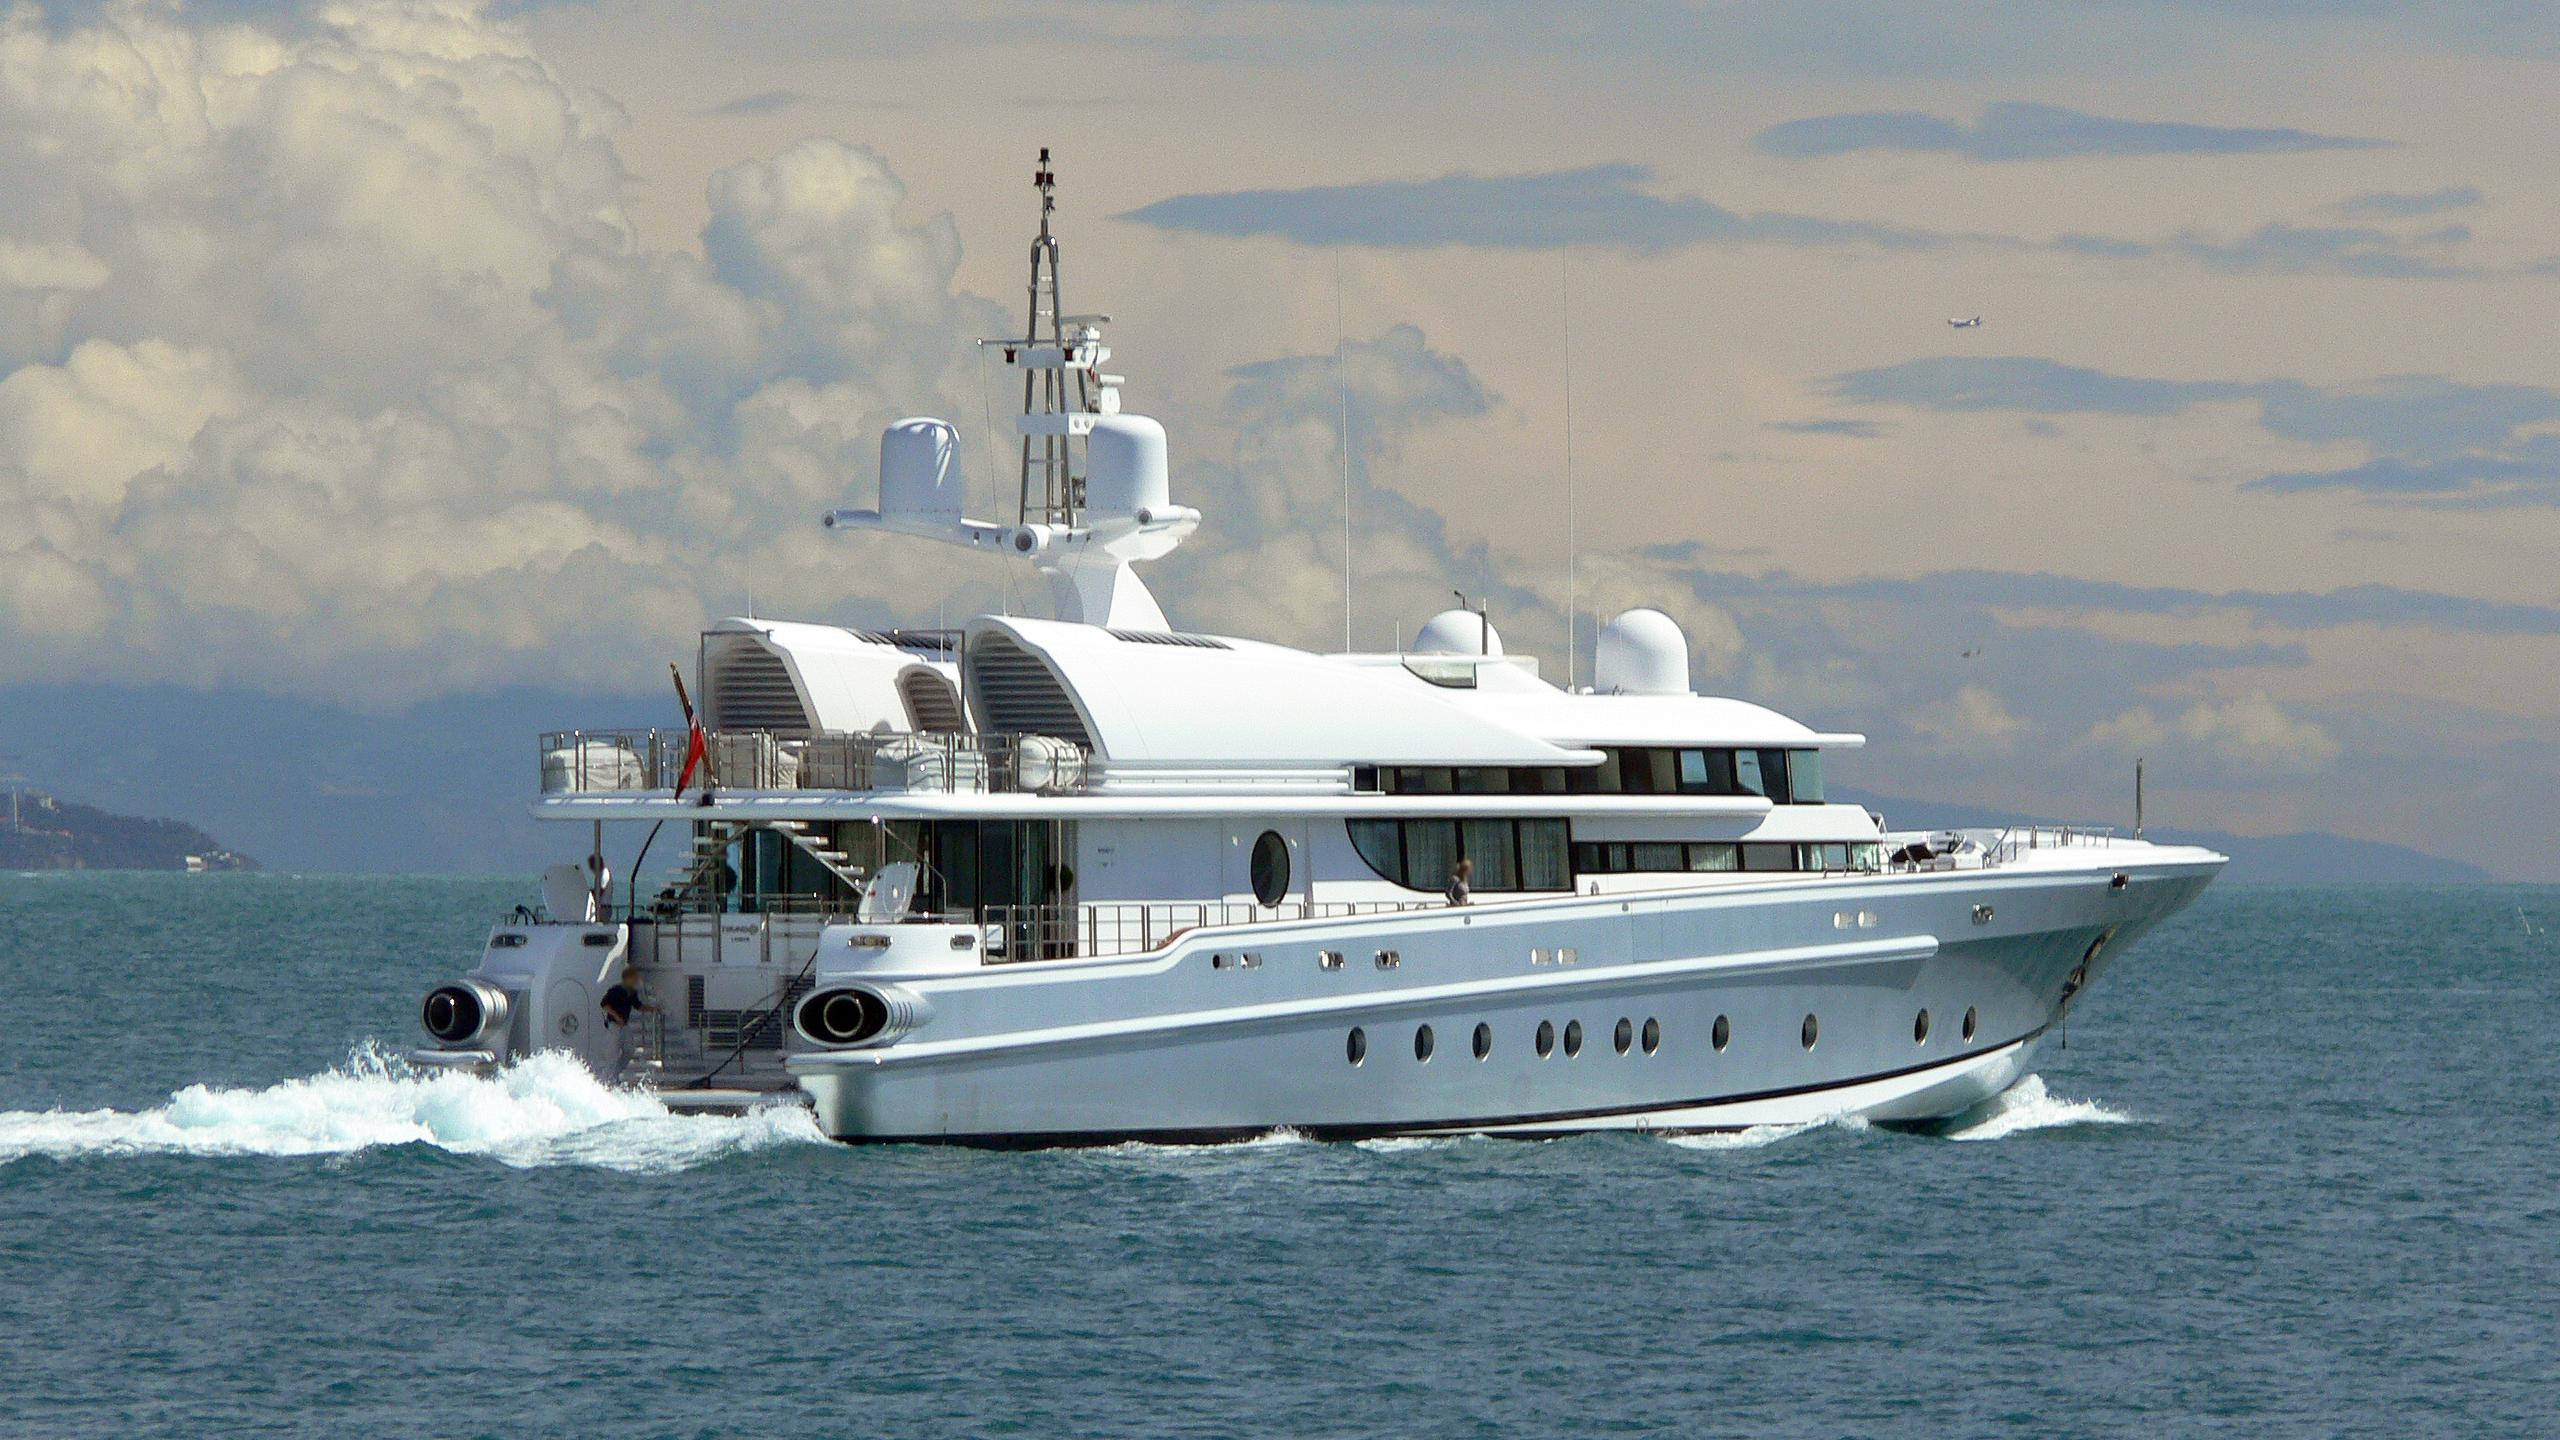 lady-k-motor-yacht-oceanfast-1998-50m-running-half-profile